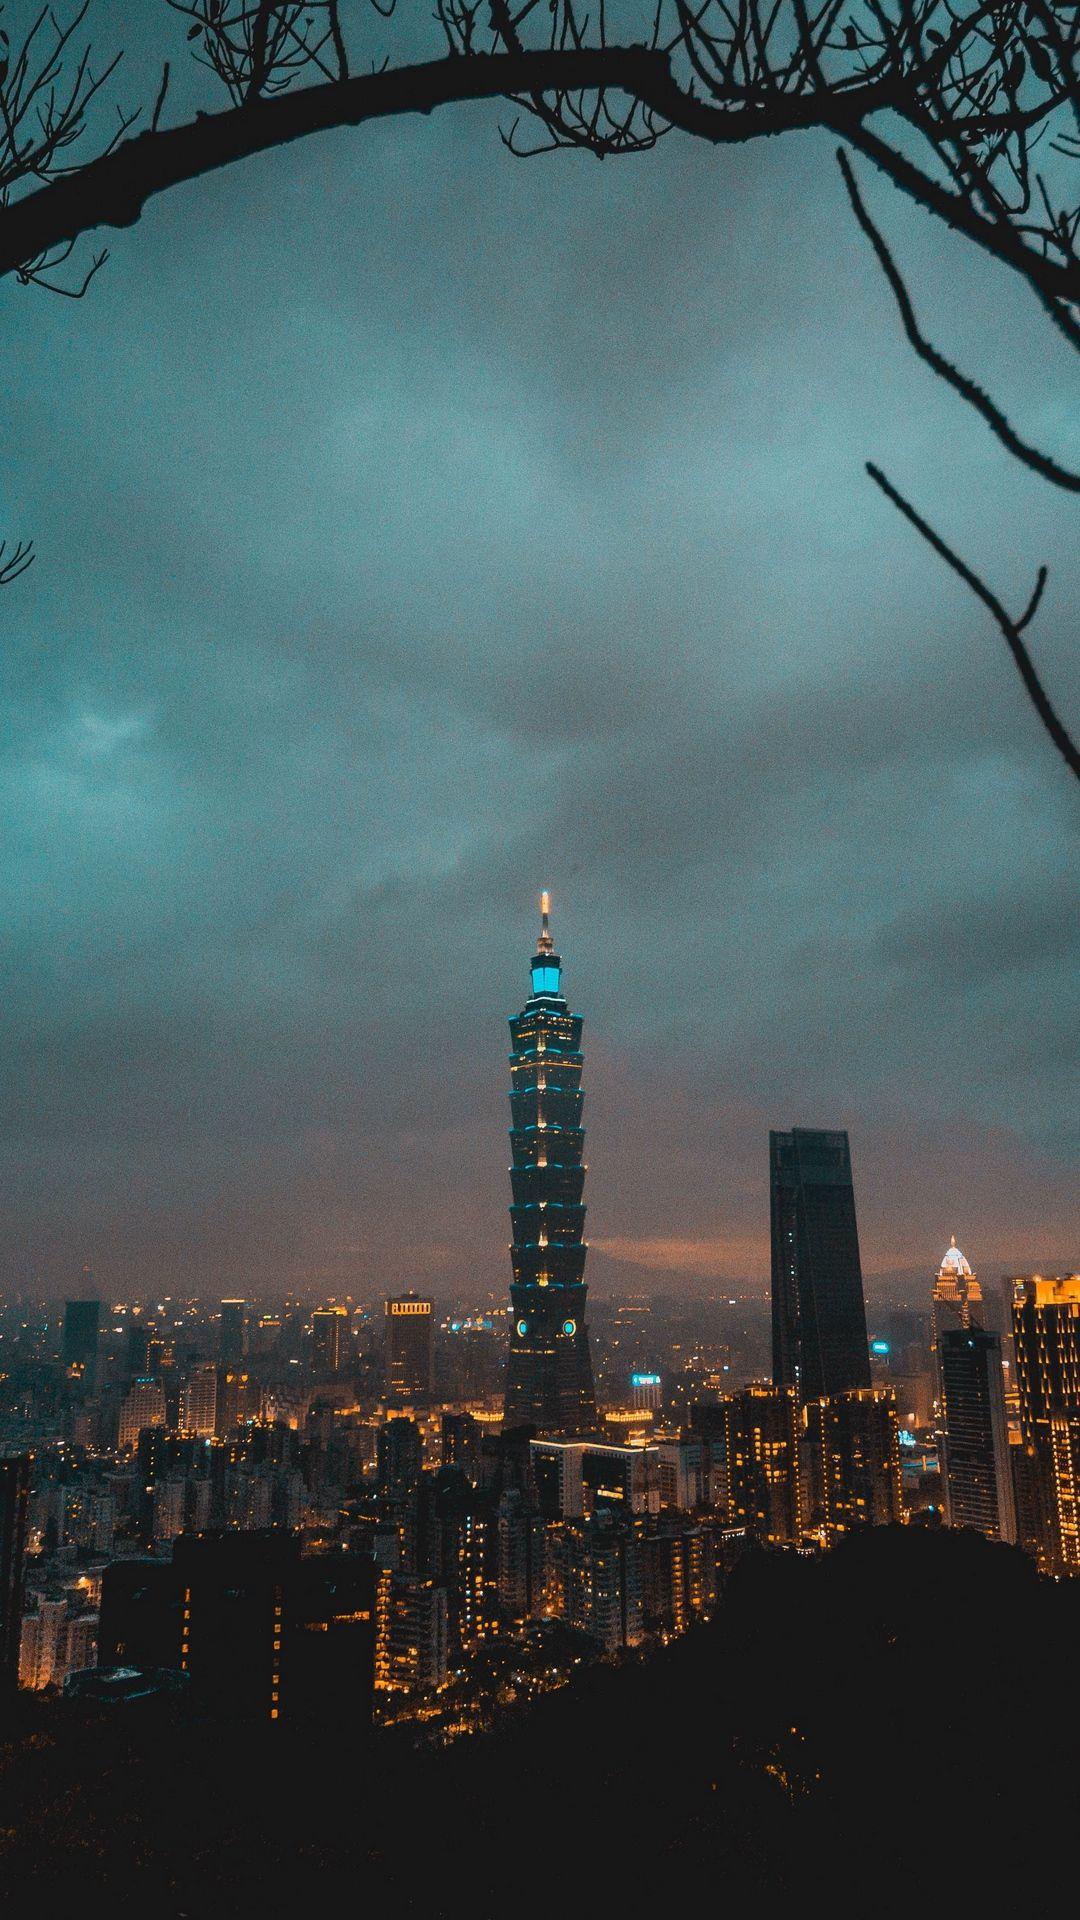 Taiwan Skyscrapers